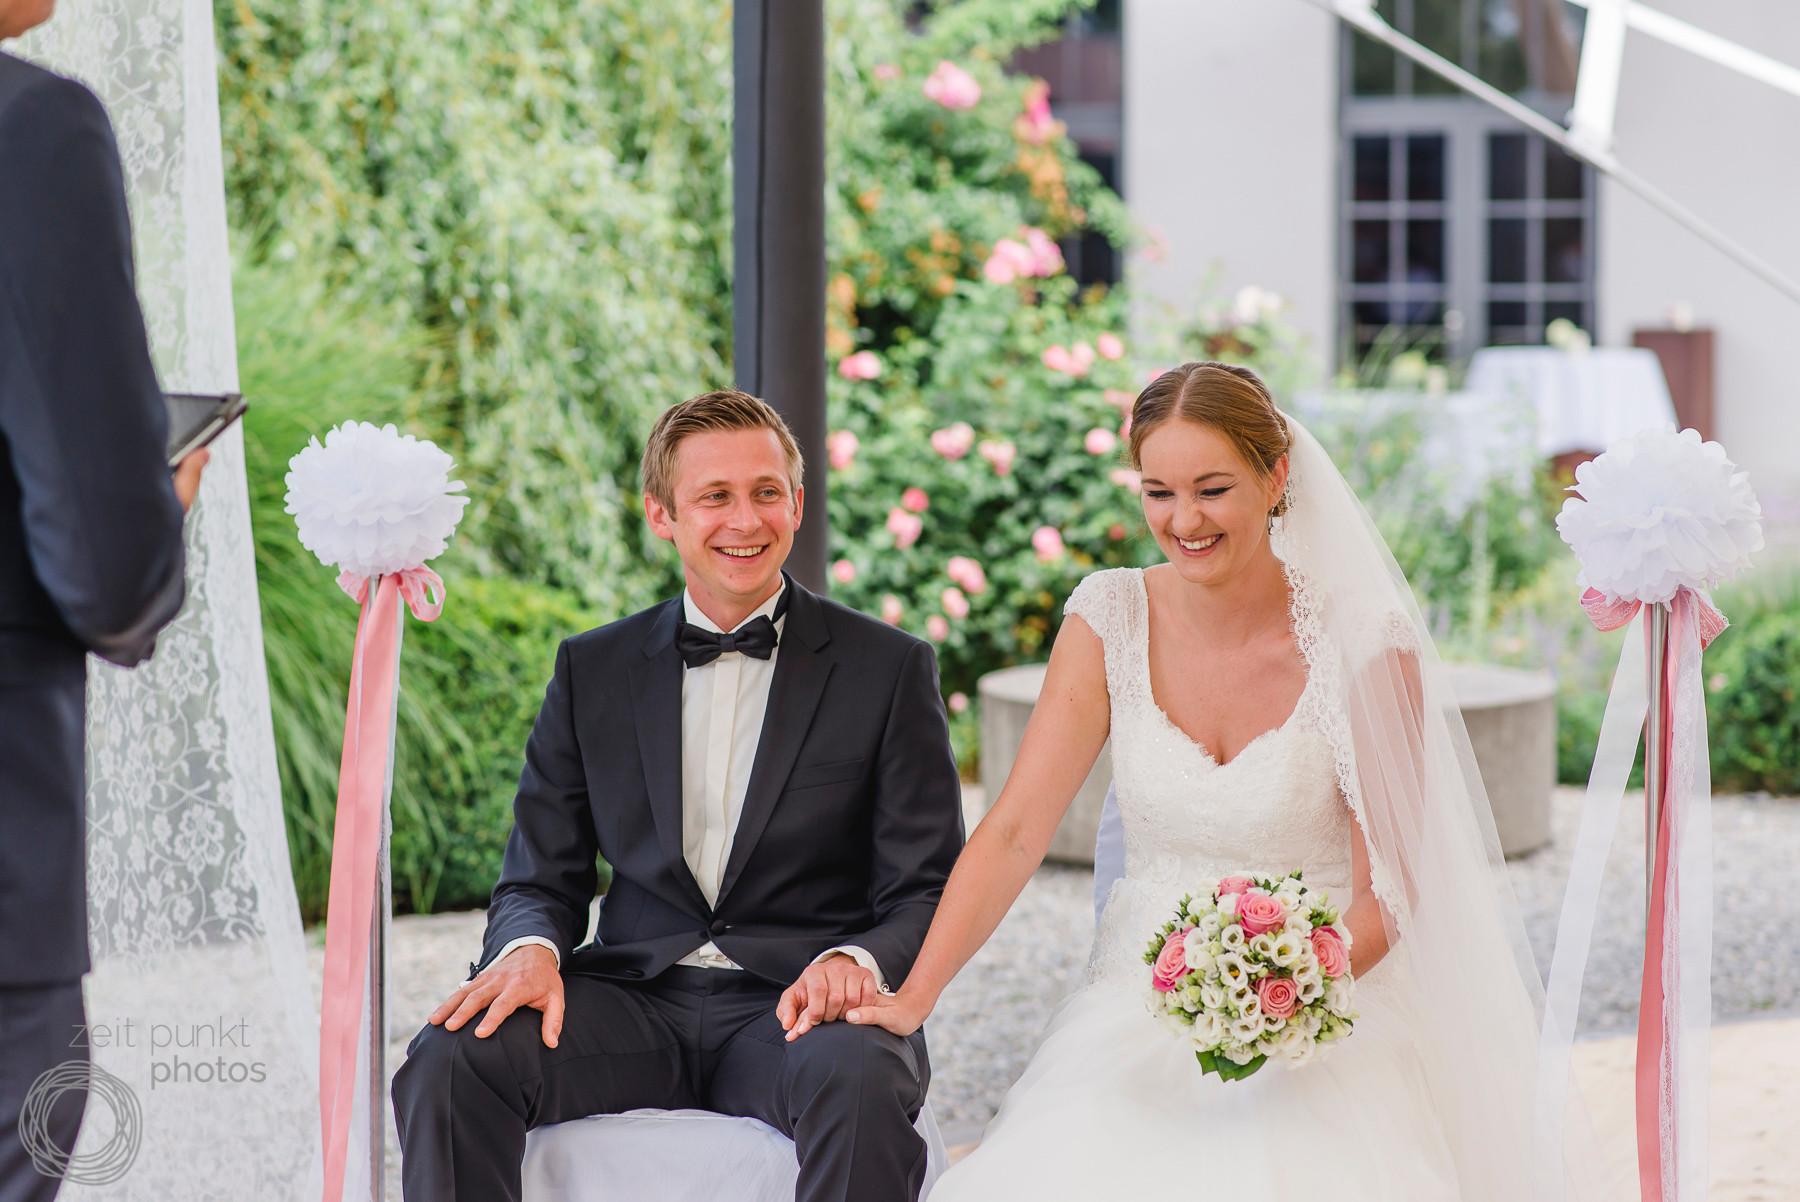 Freie Trauung Claudia & Matthias (Fotos: zeit punkt photos)